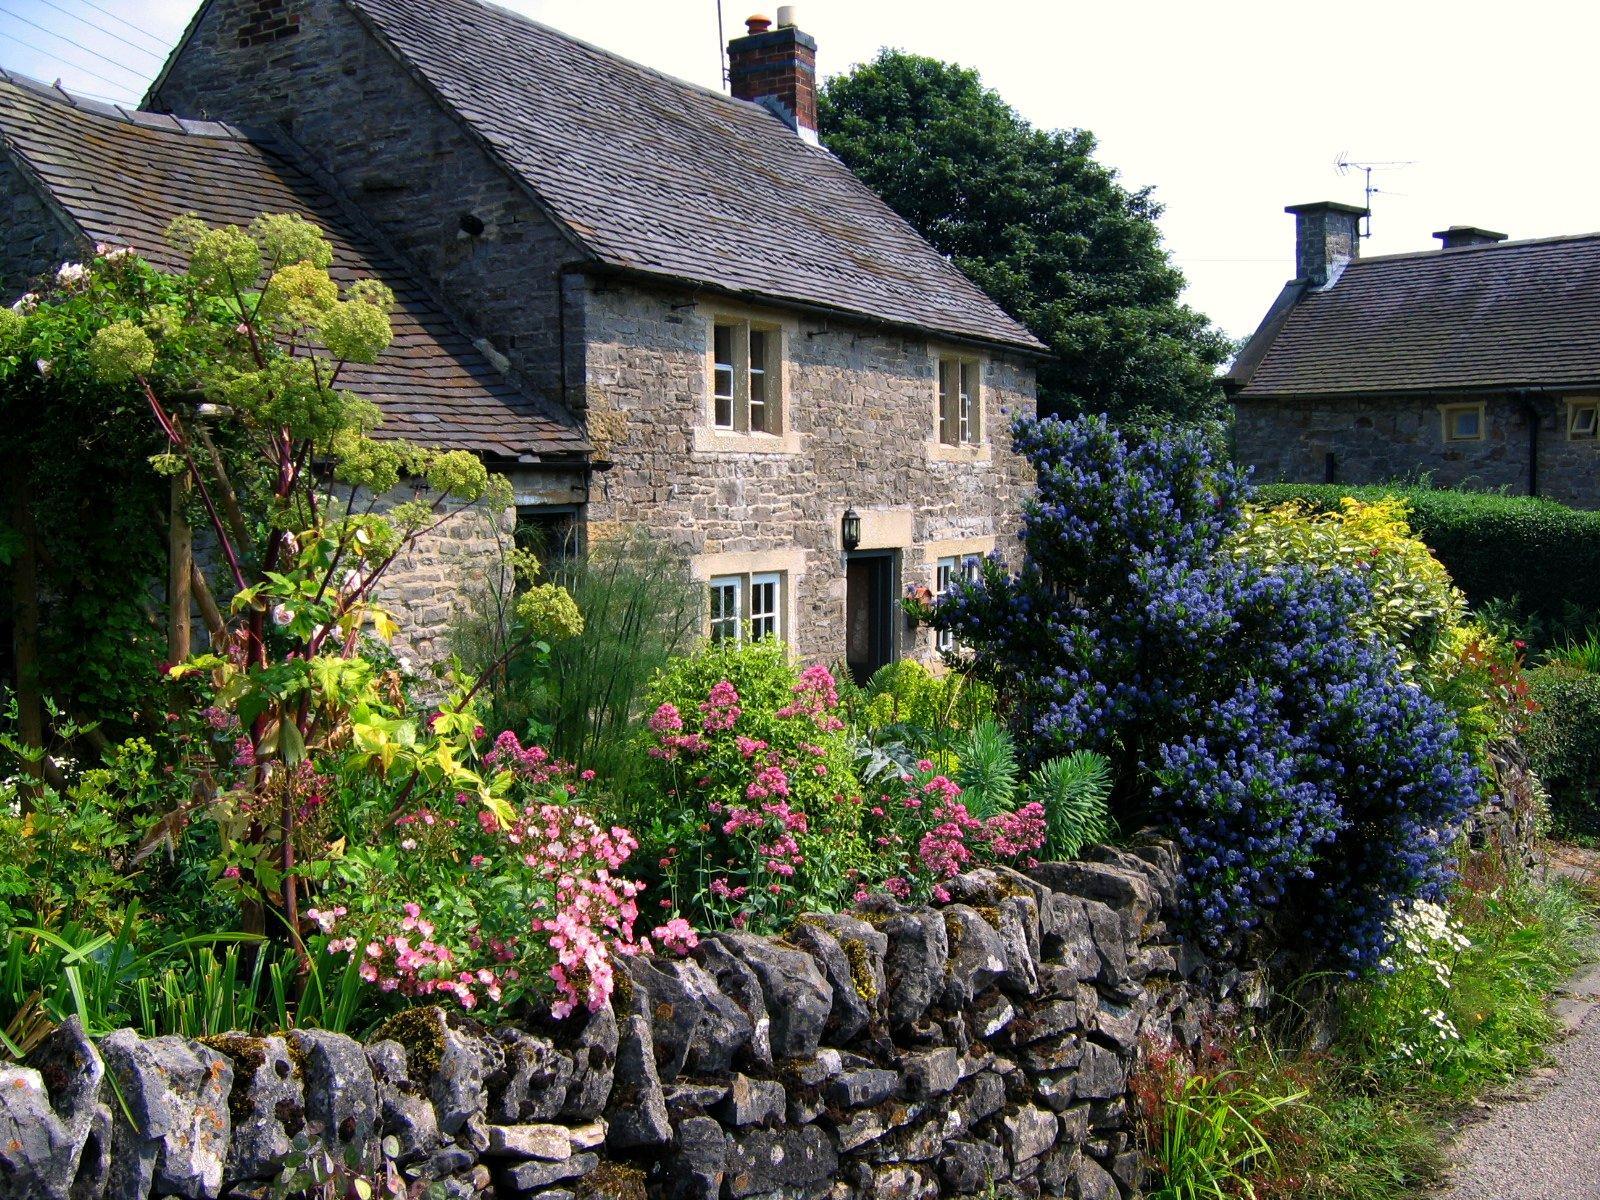 countryside home lien brilleslijper - HD1600×1200